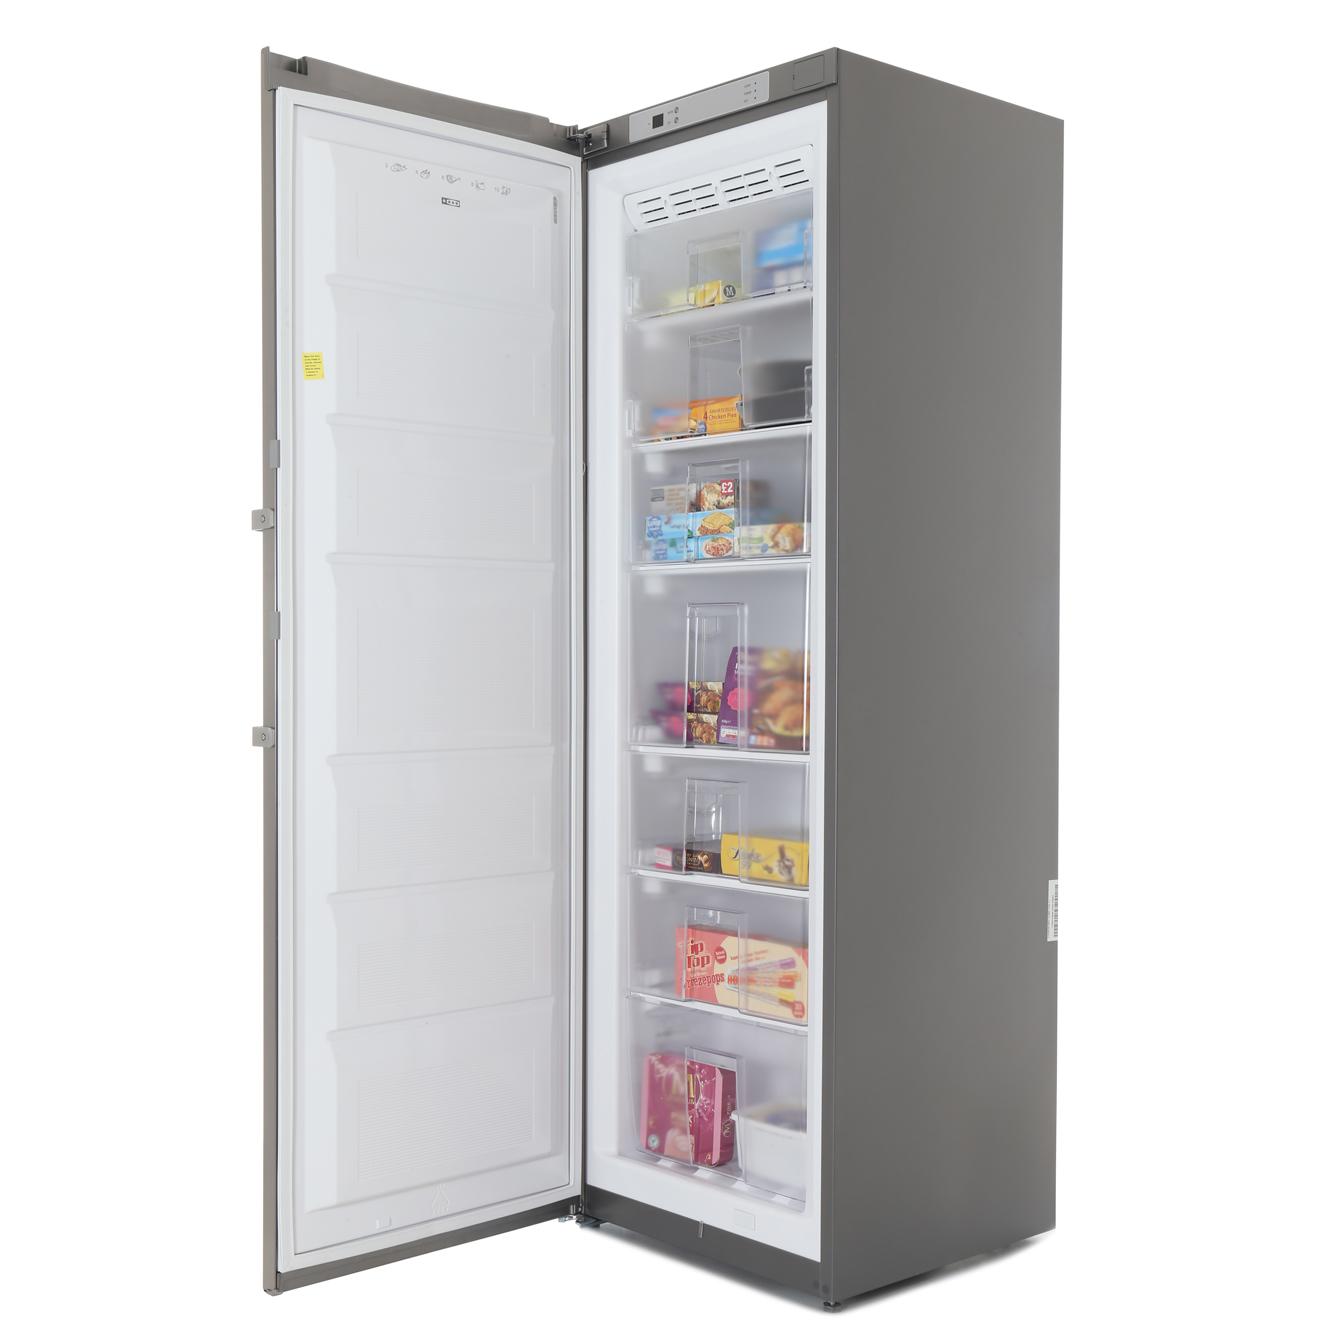 Smeg tall freezer